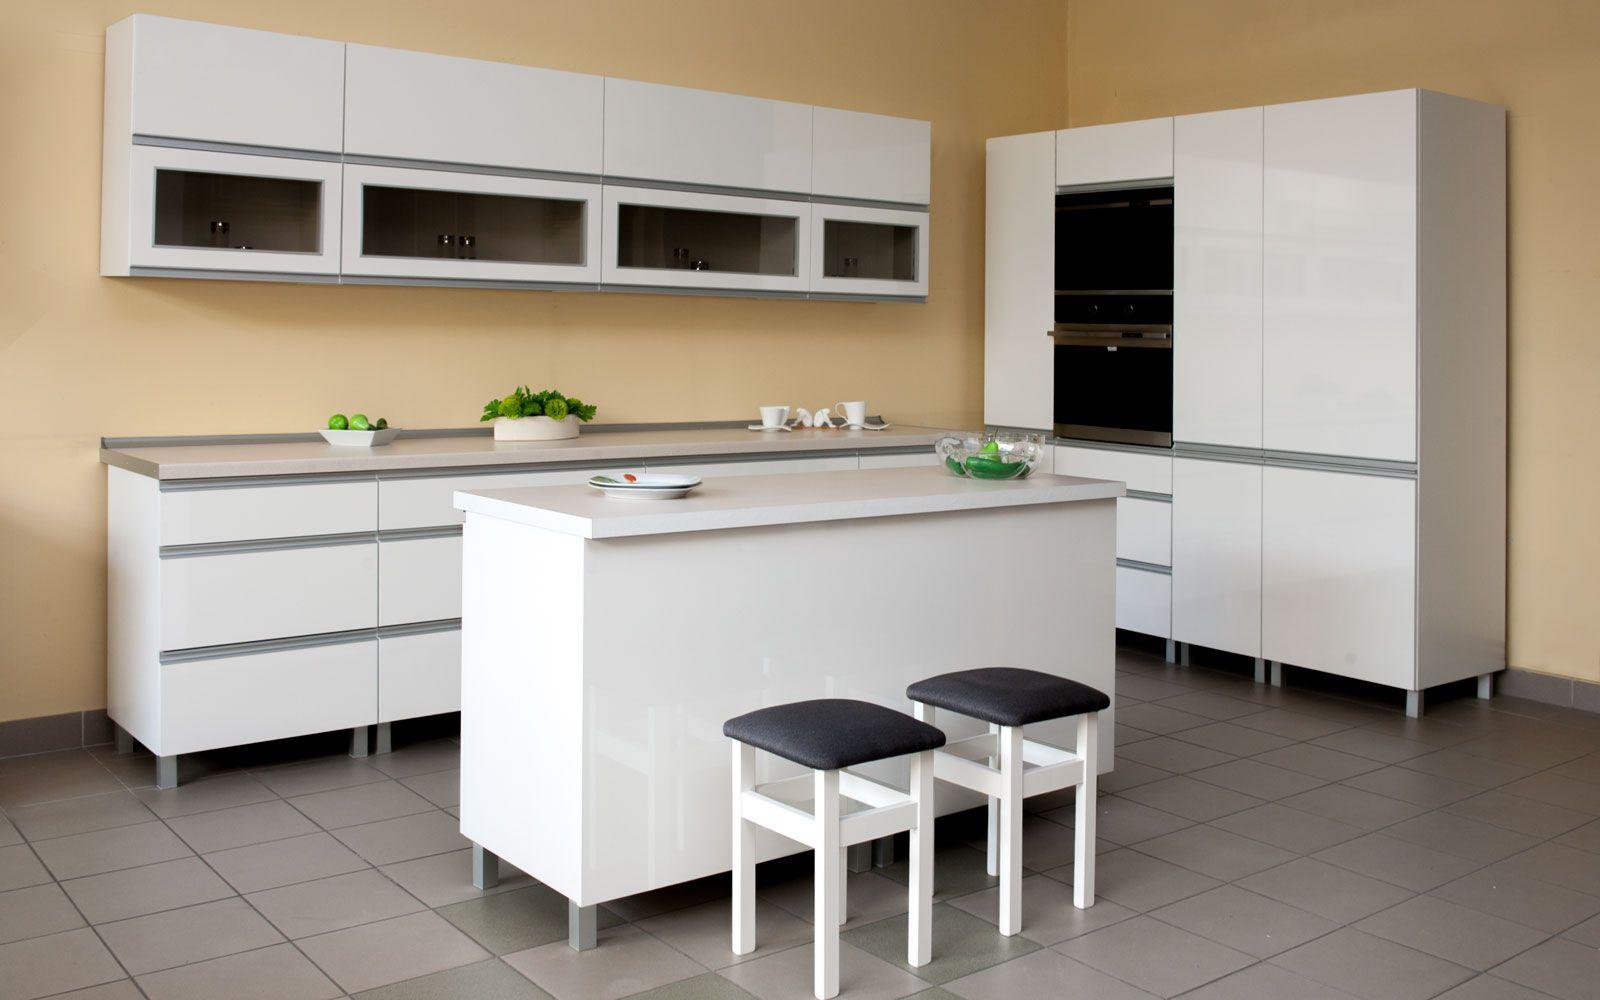 Fabryka Mebli Bodzio Home Home Decor Furniture I Table